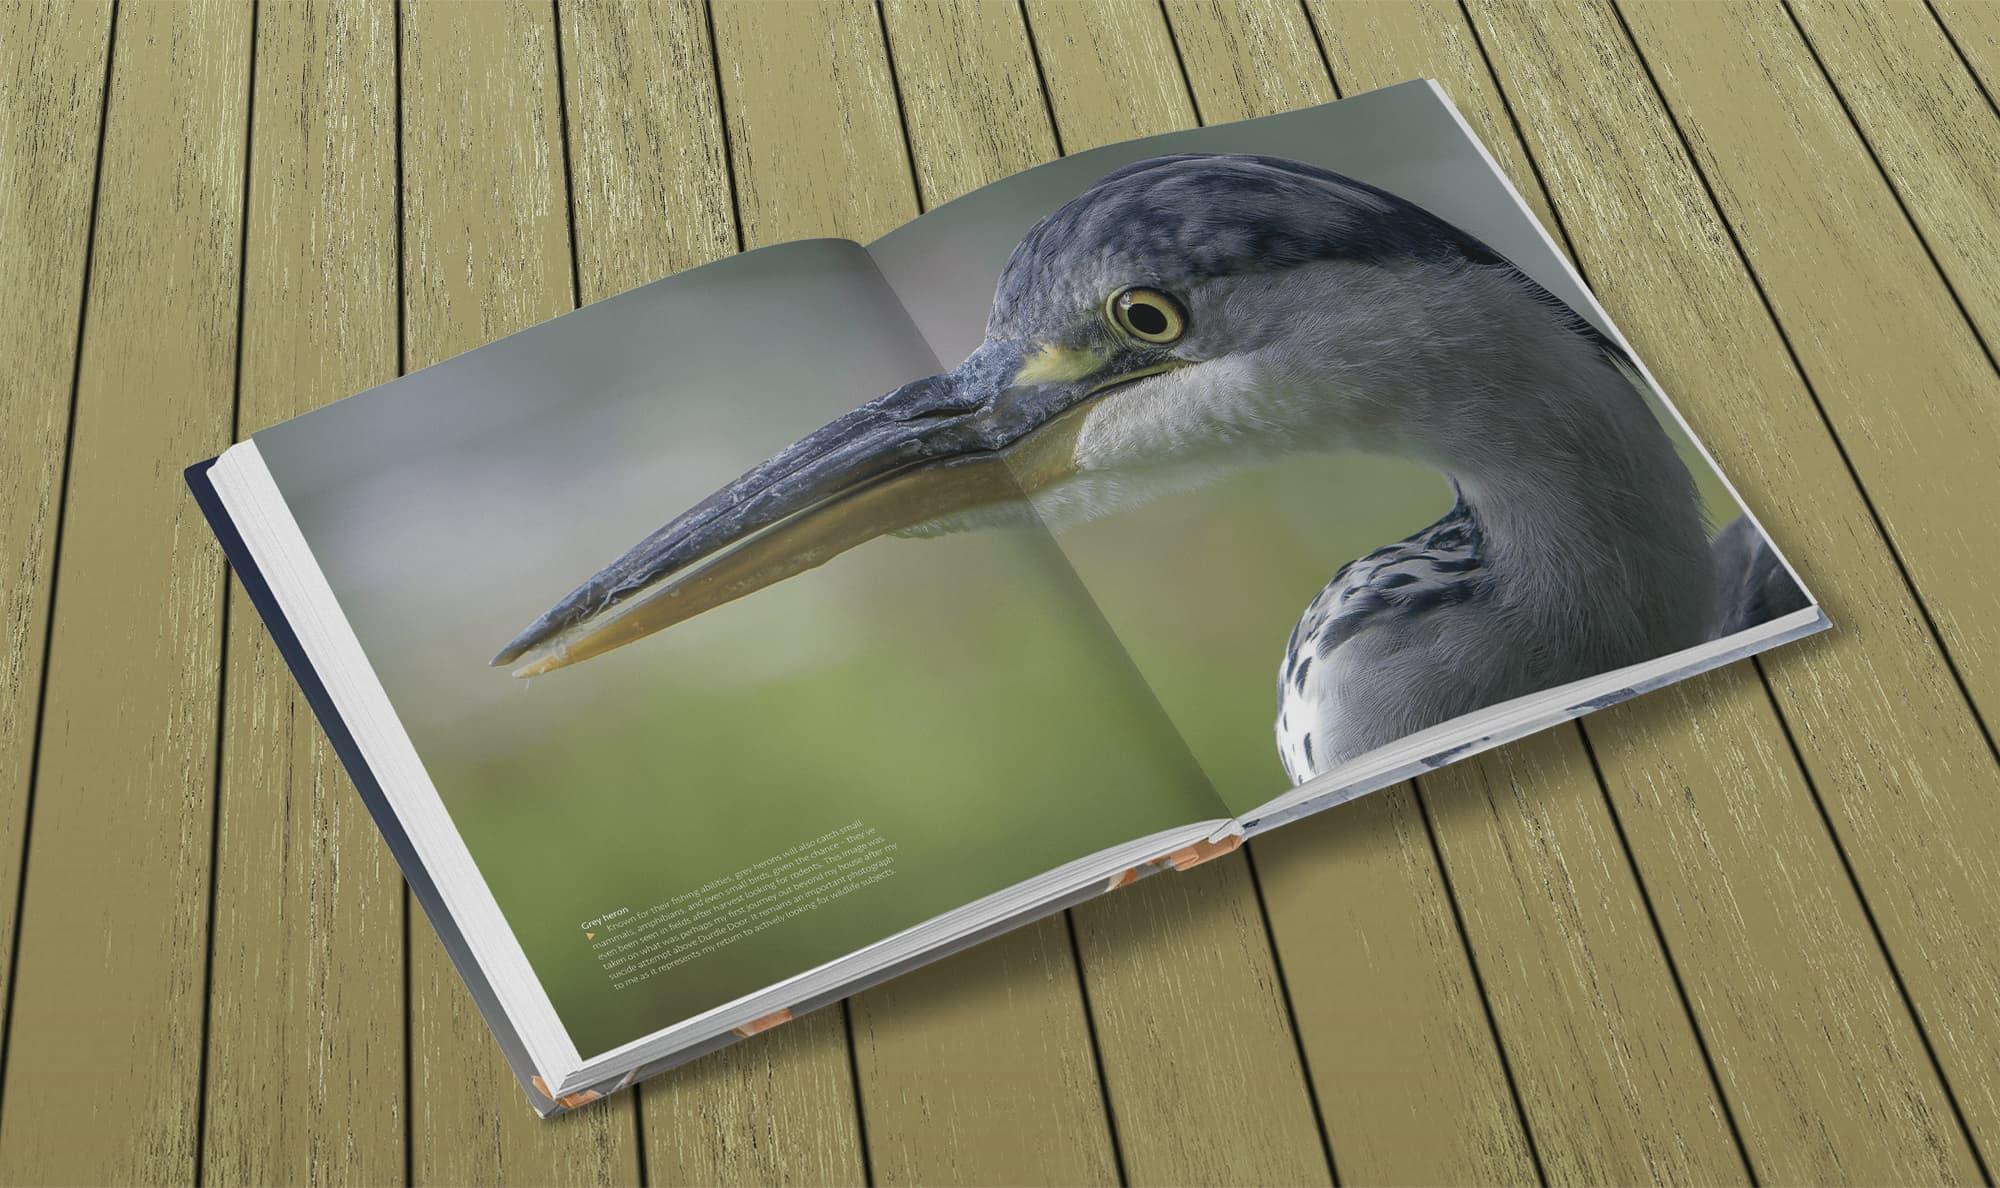 Wildlife Photography by Paul Williams – Heron